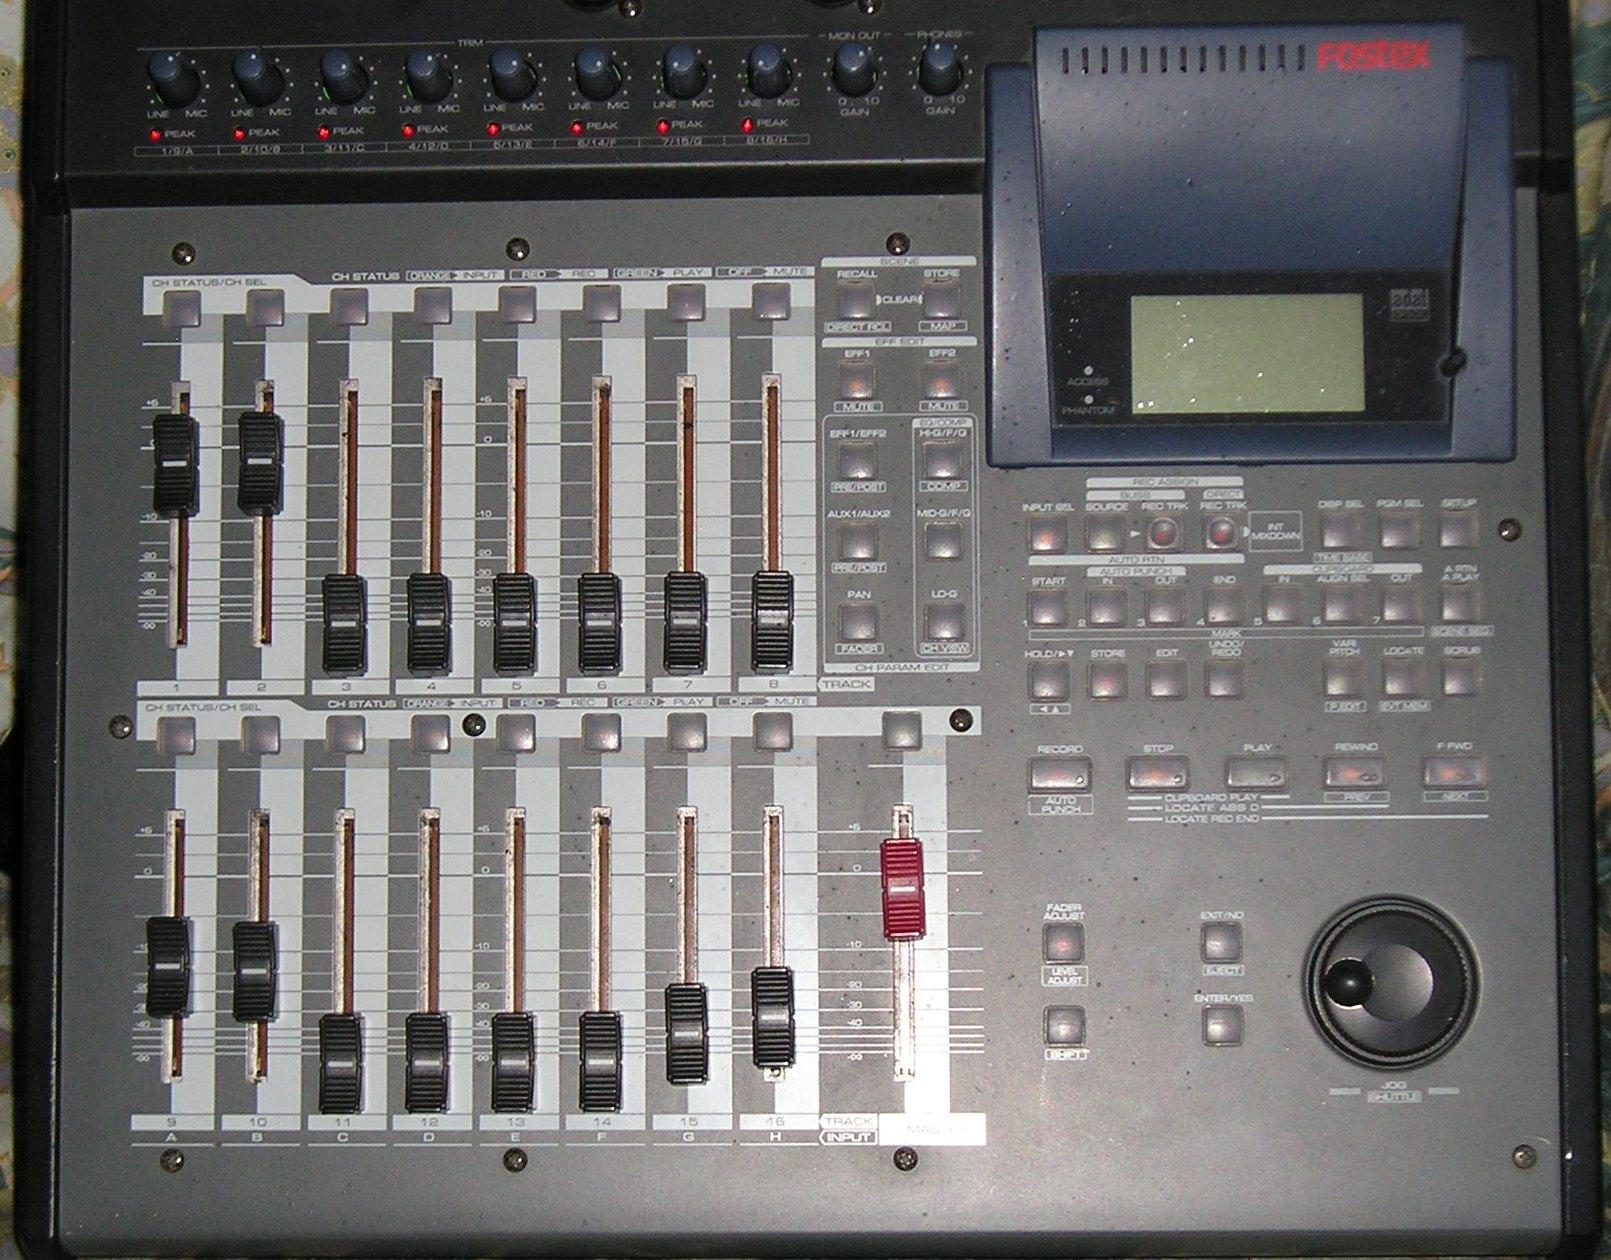 fostex vf160 image 380375 audiofanzine rh en audiofanzine com Fostex VF160EX Hard Drive Fostex VF160 Manual